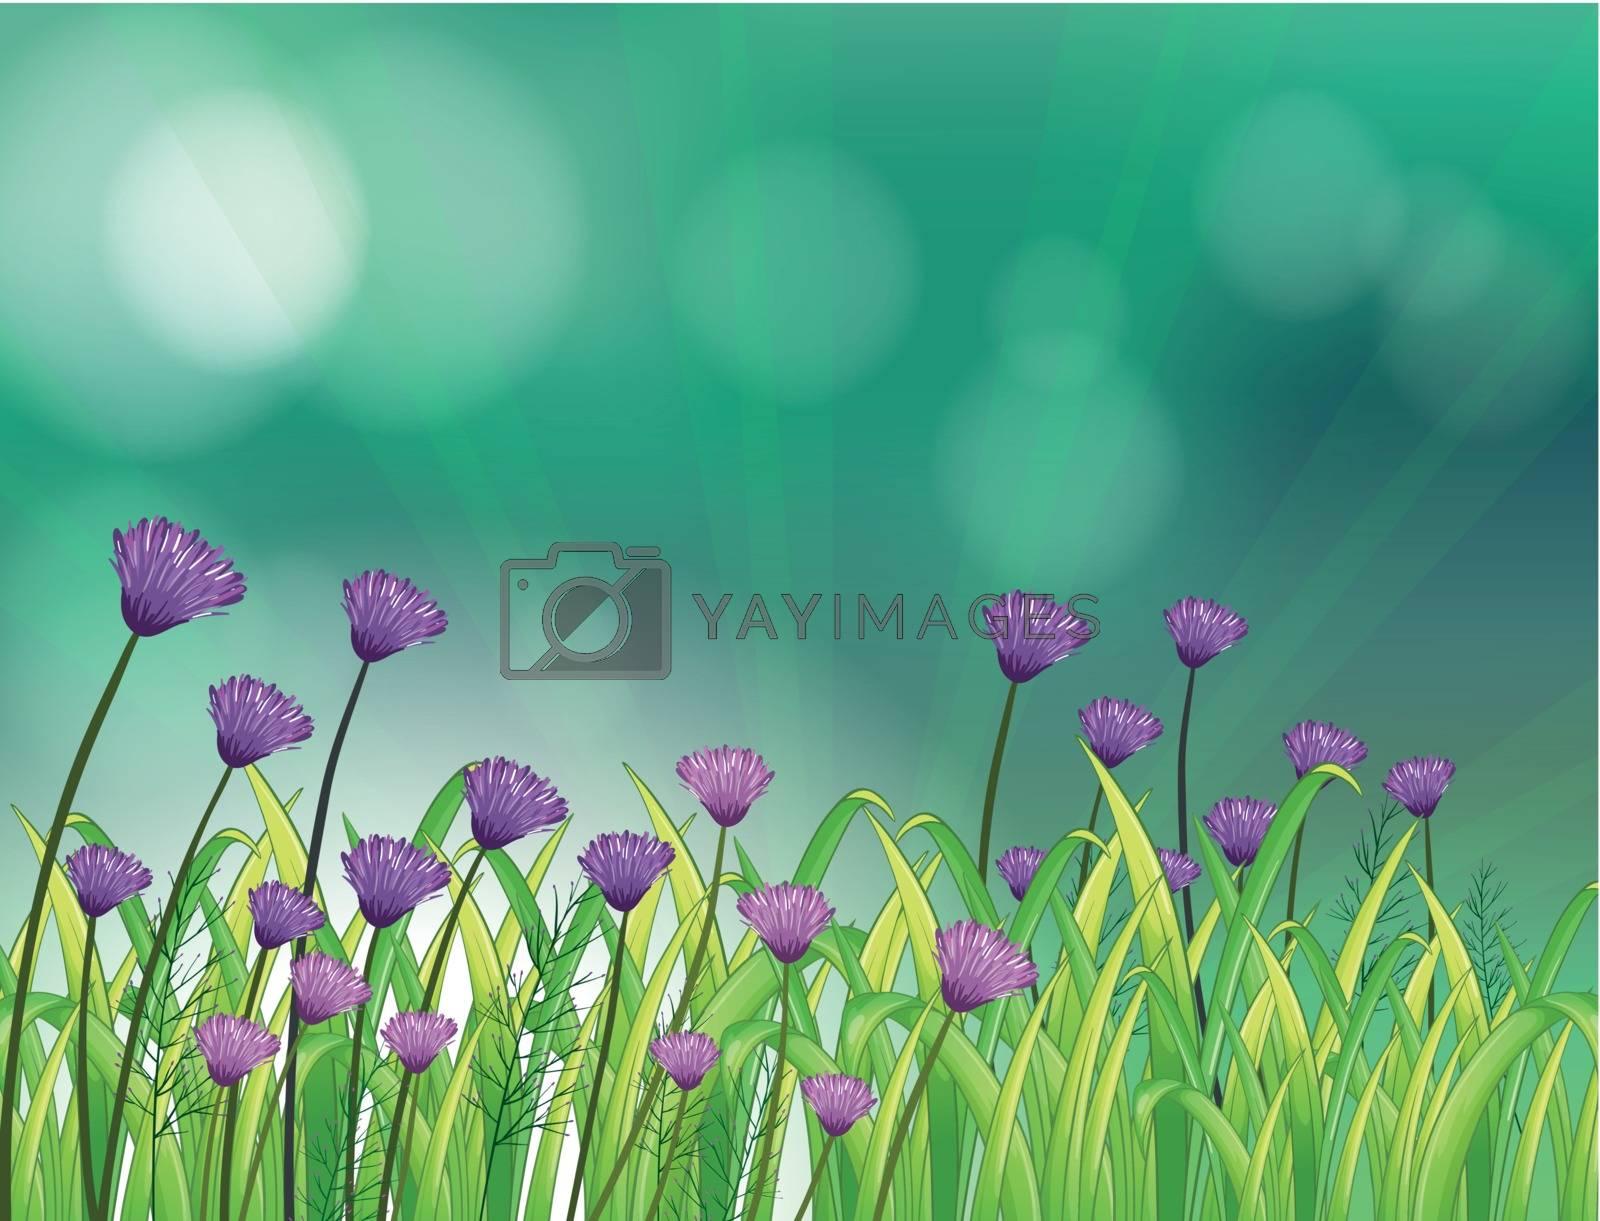 lllustration of a garden with violet flowers